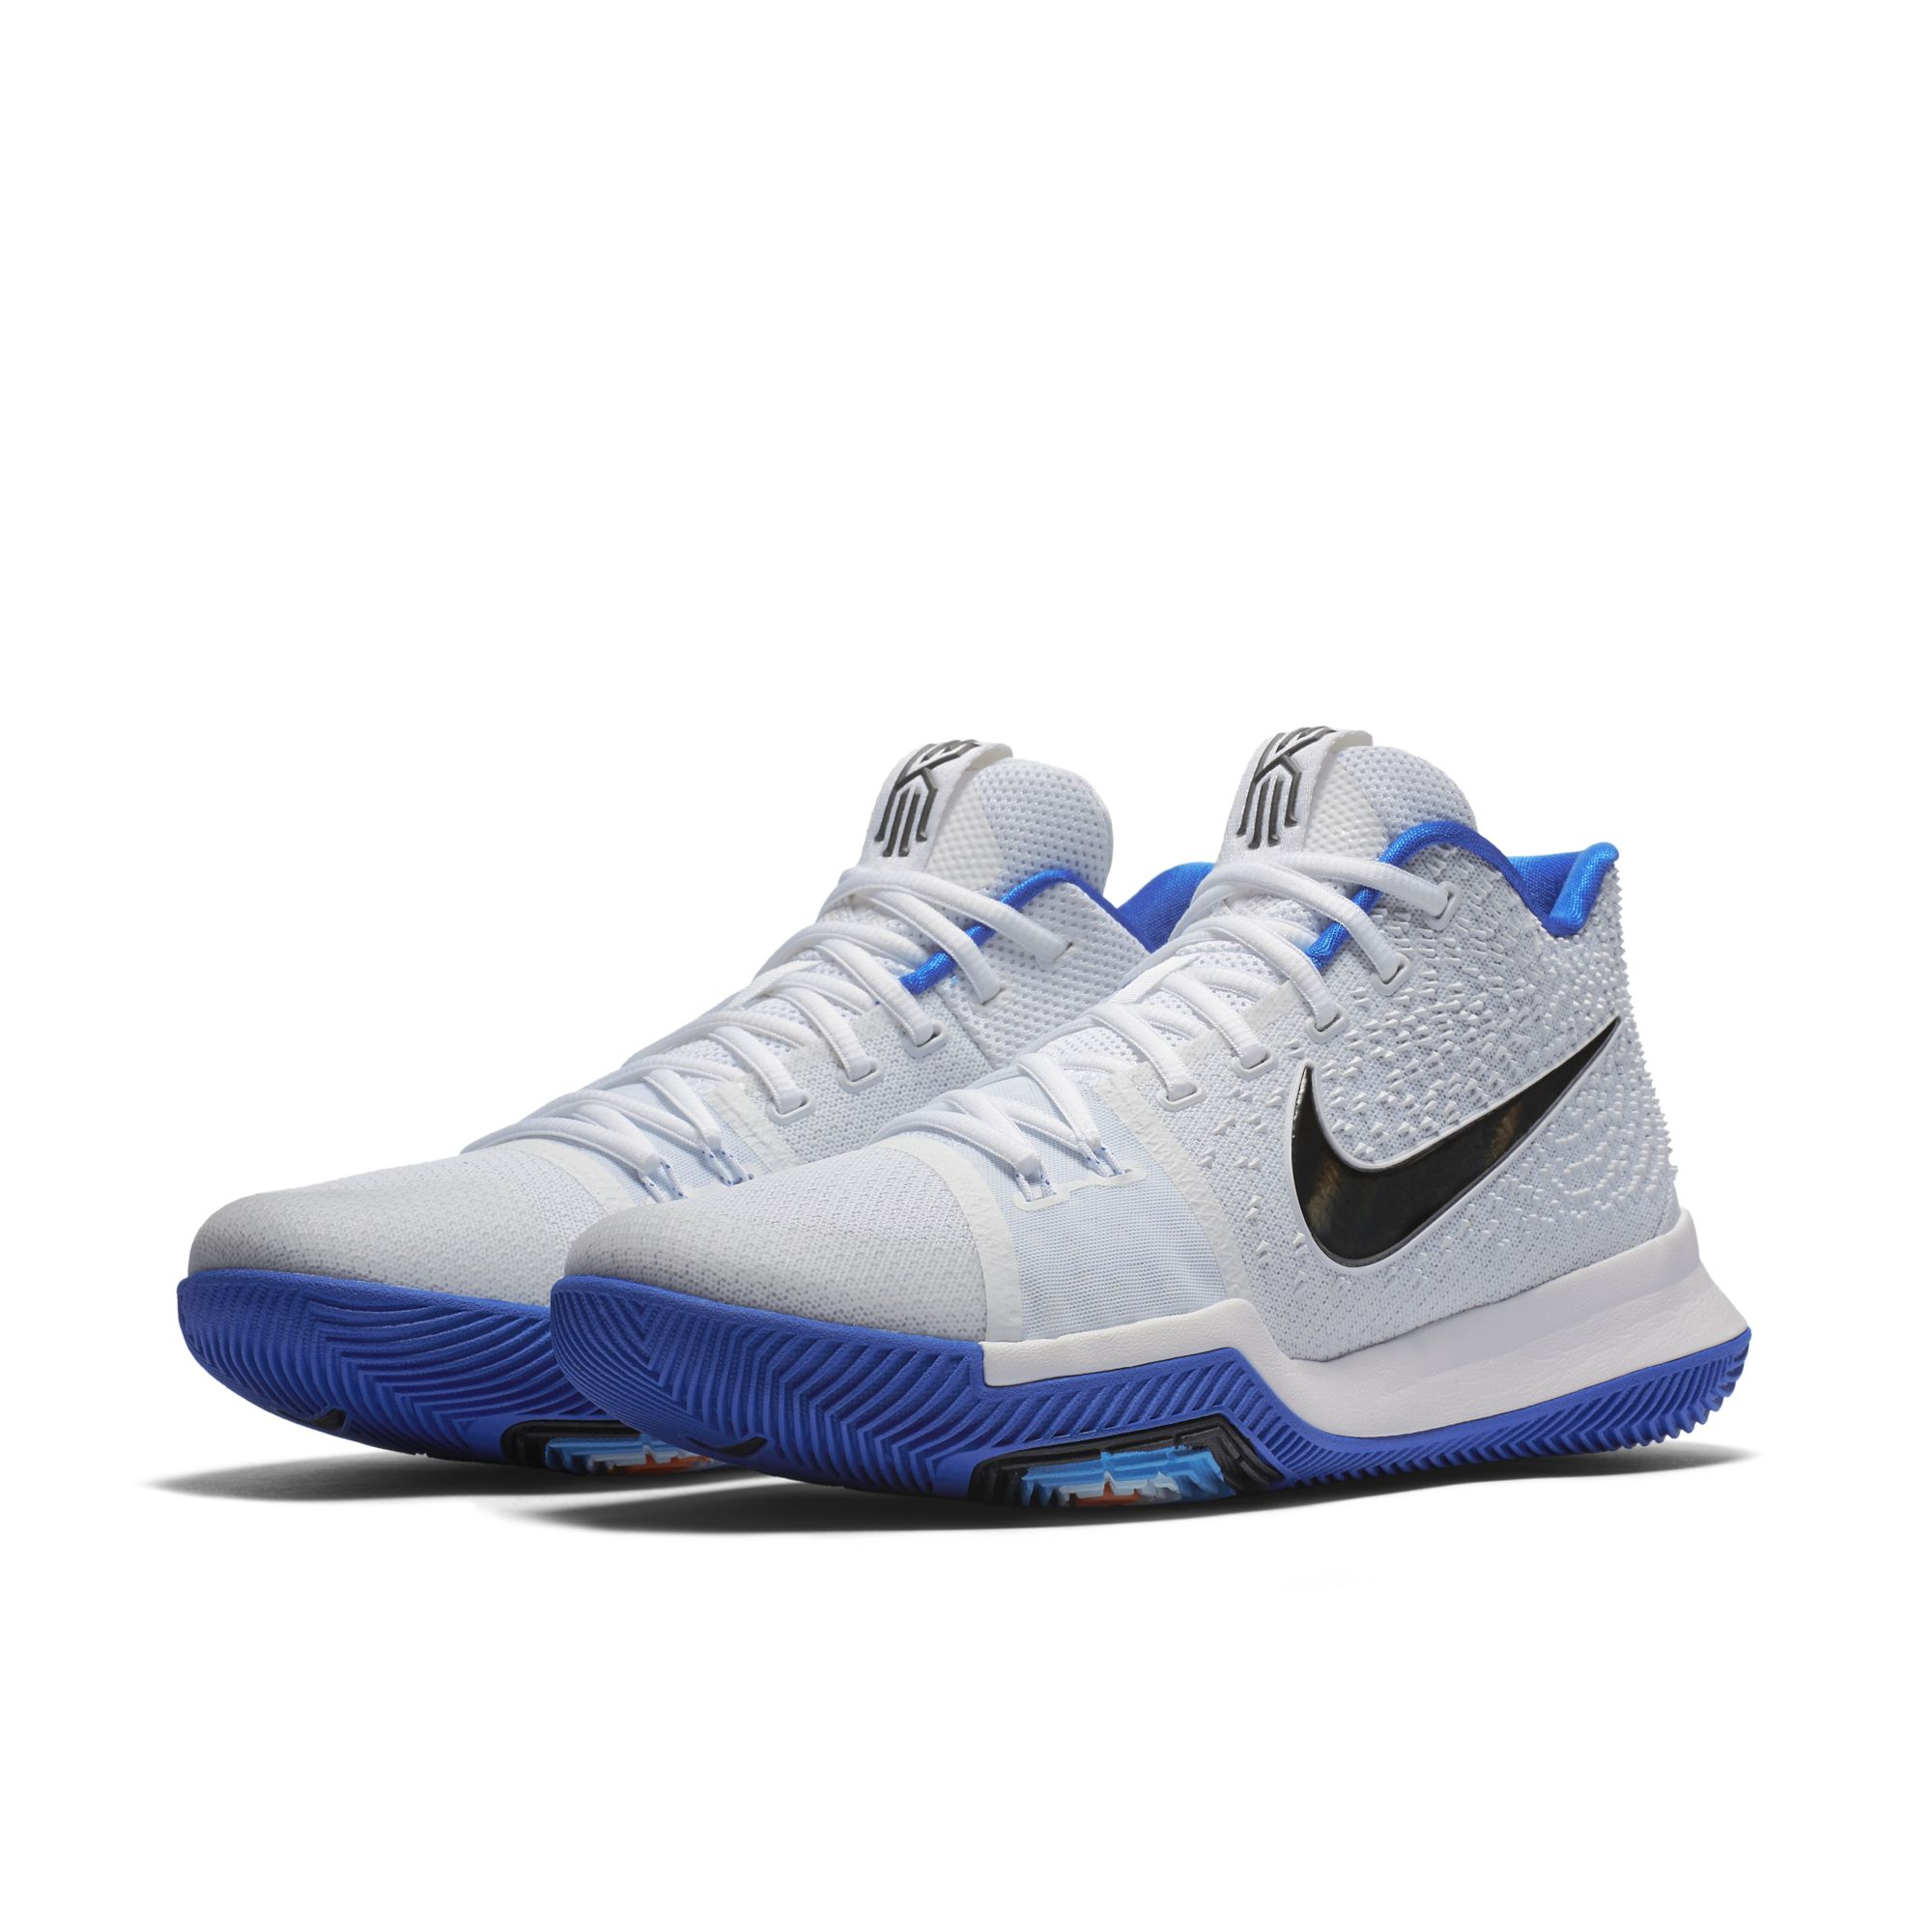 Nike Kyrie 3 'hyper Cobalt'  Weartesters